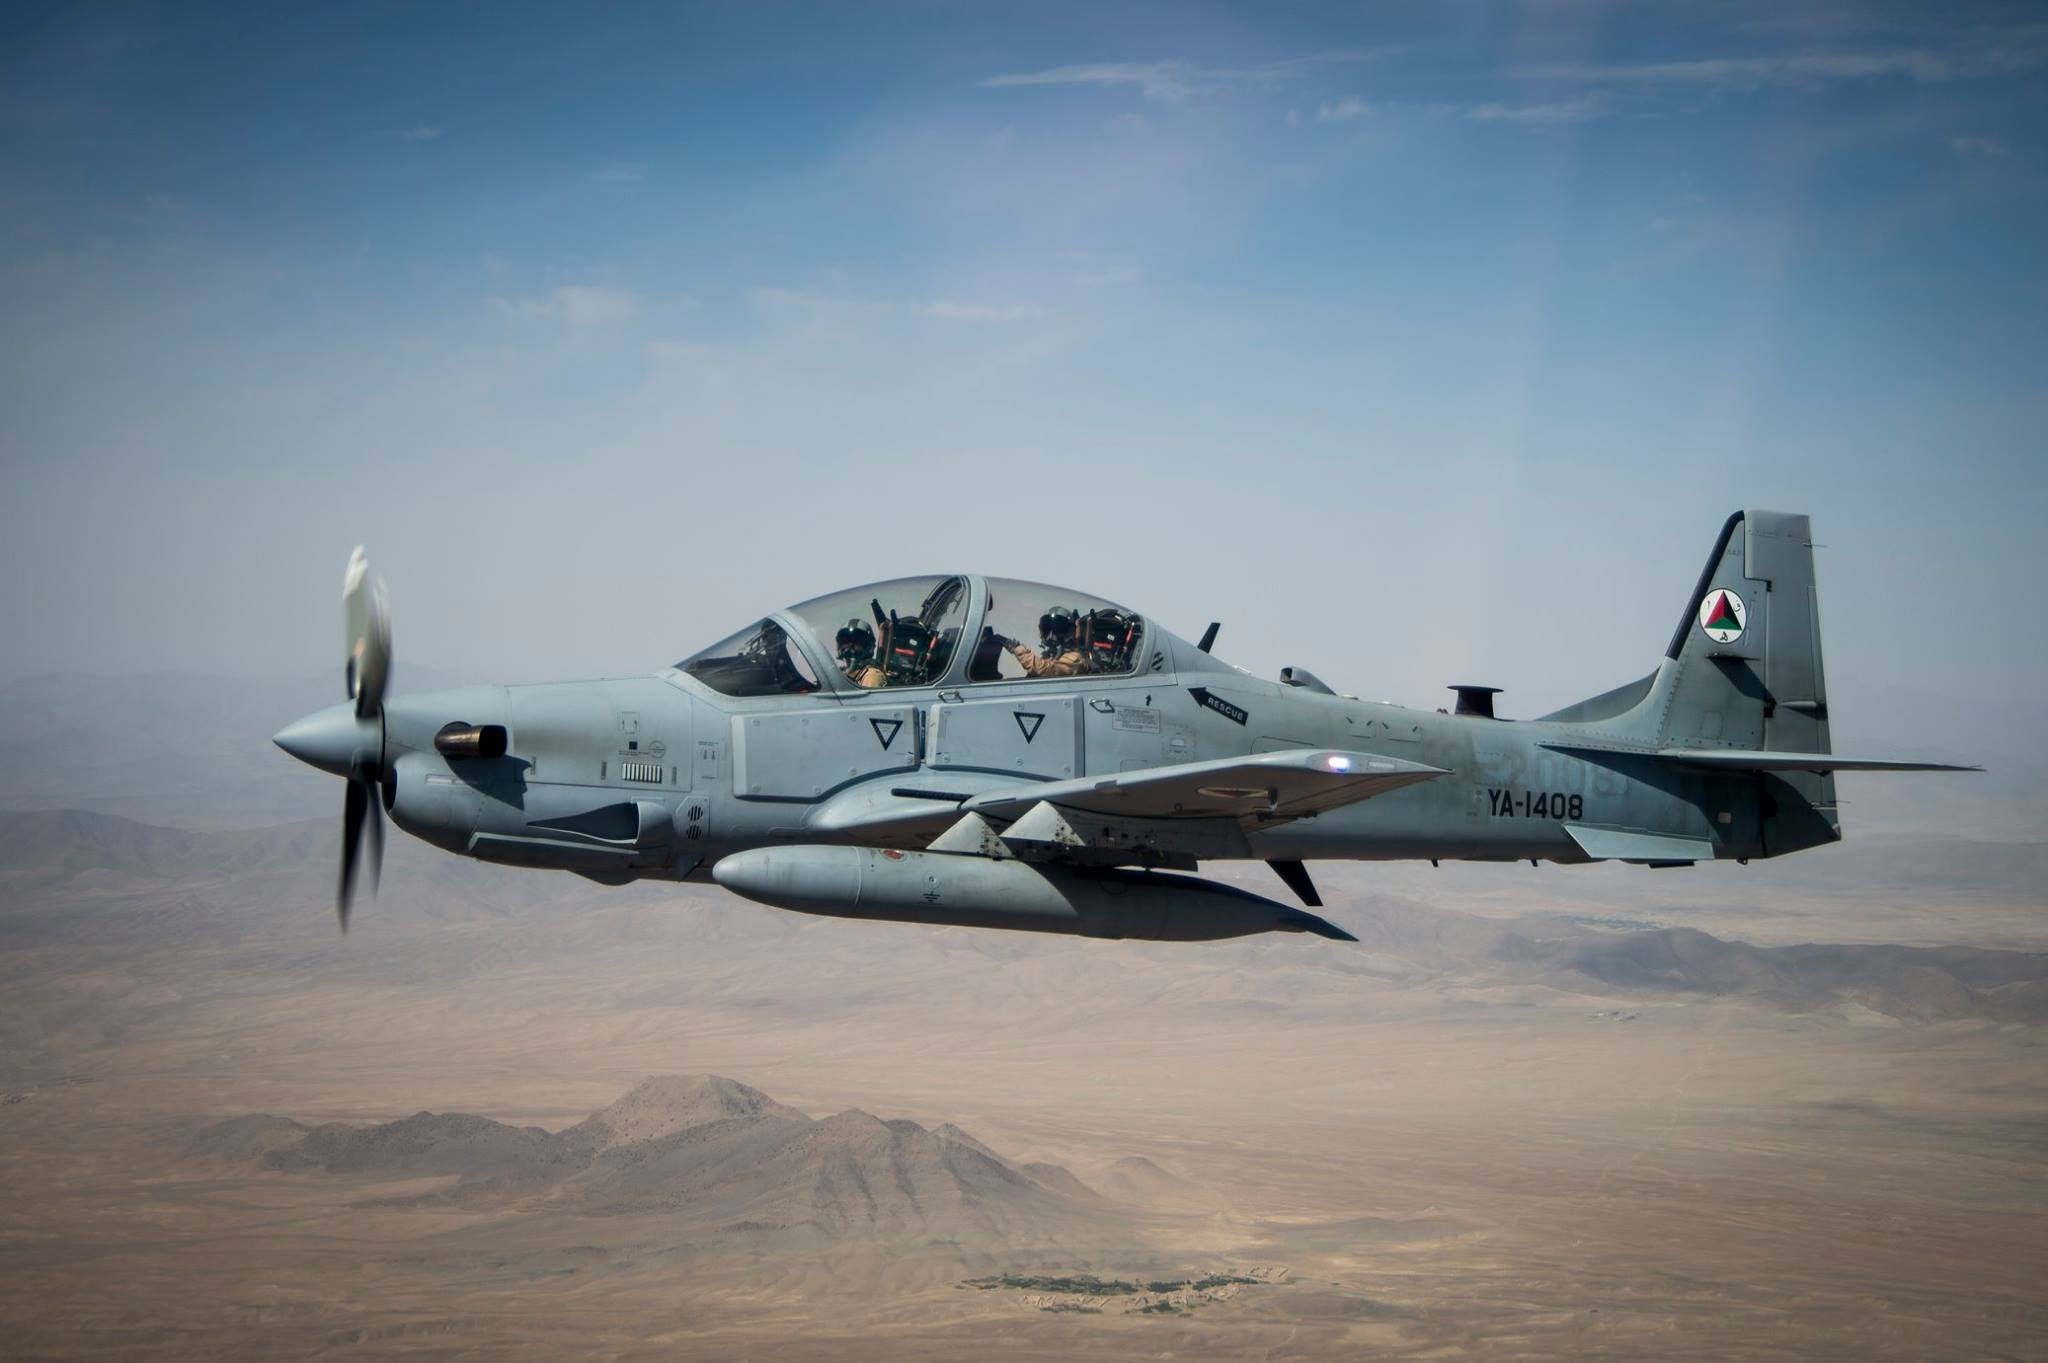 Afghan Air Force A-29 Super Tucano over Kabul [2048 × 1363